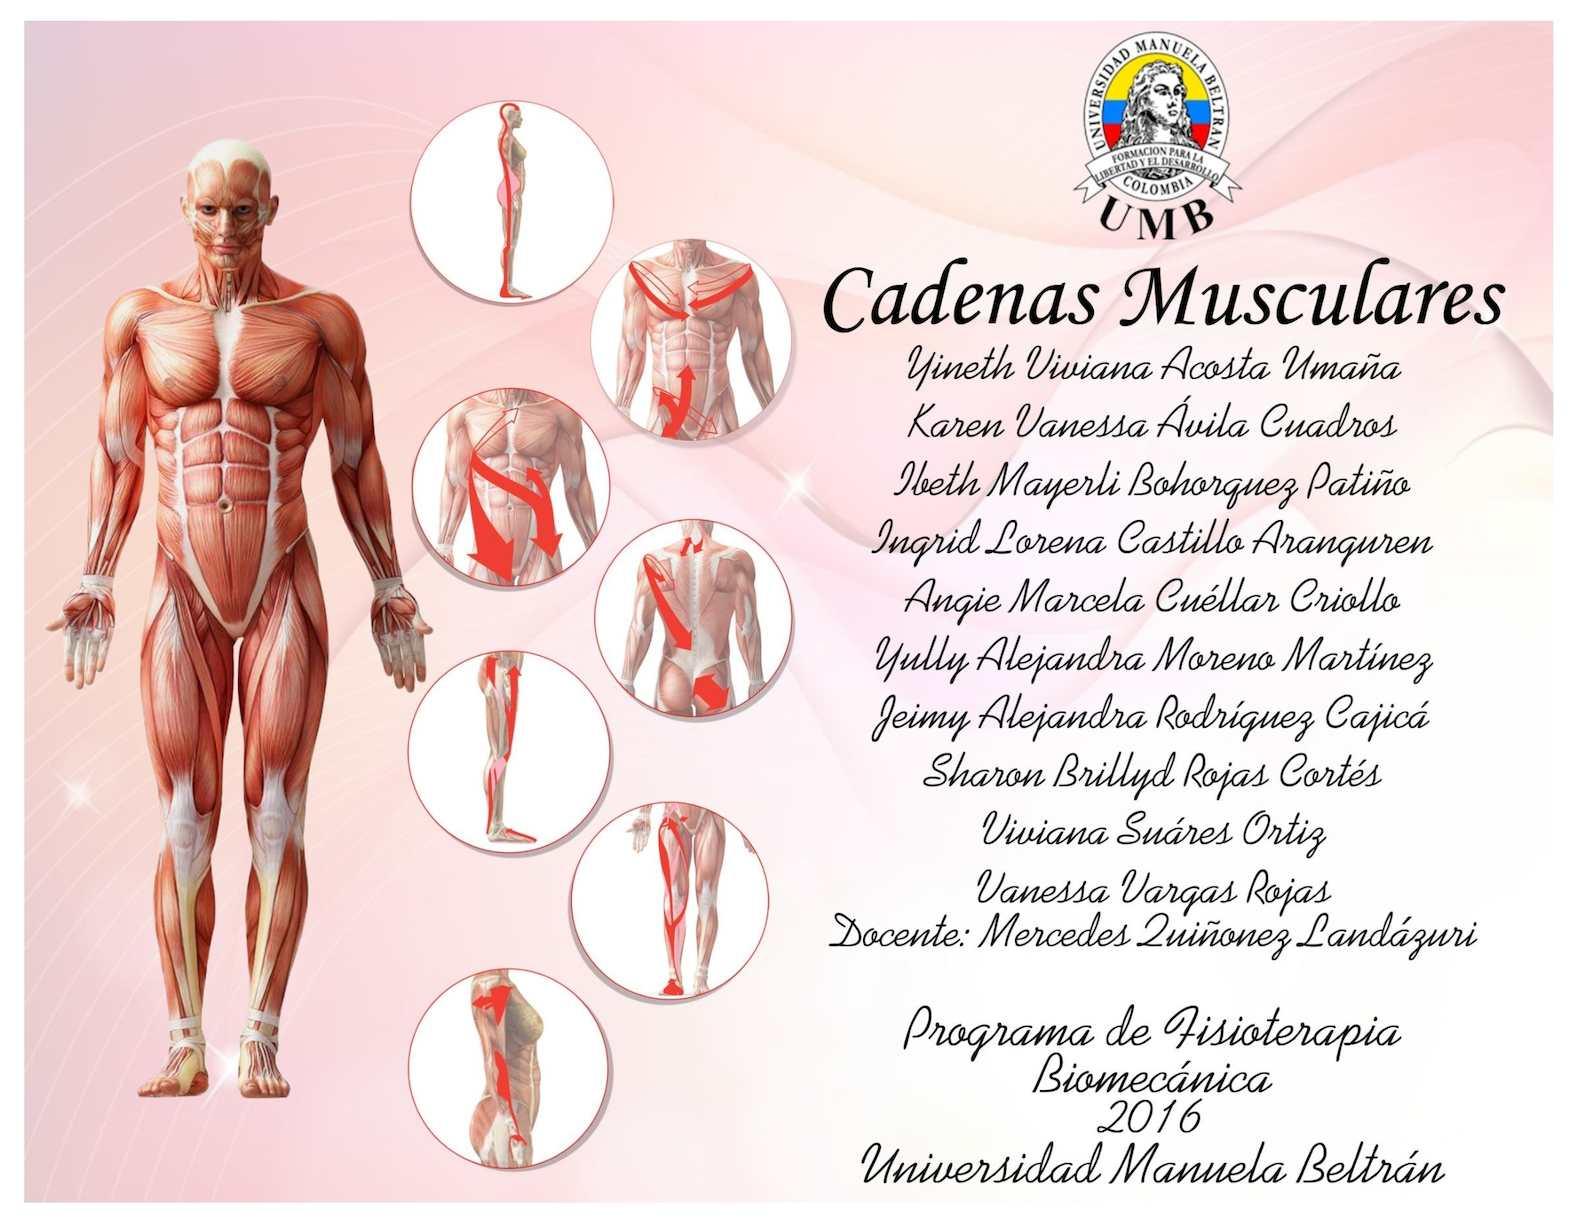 Cartilla Cadenas Musculares